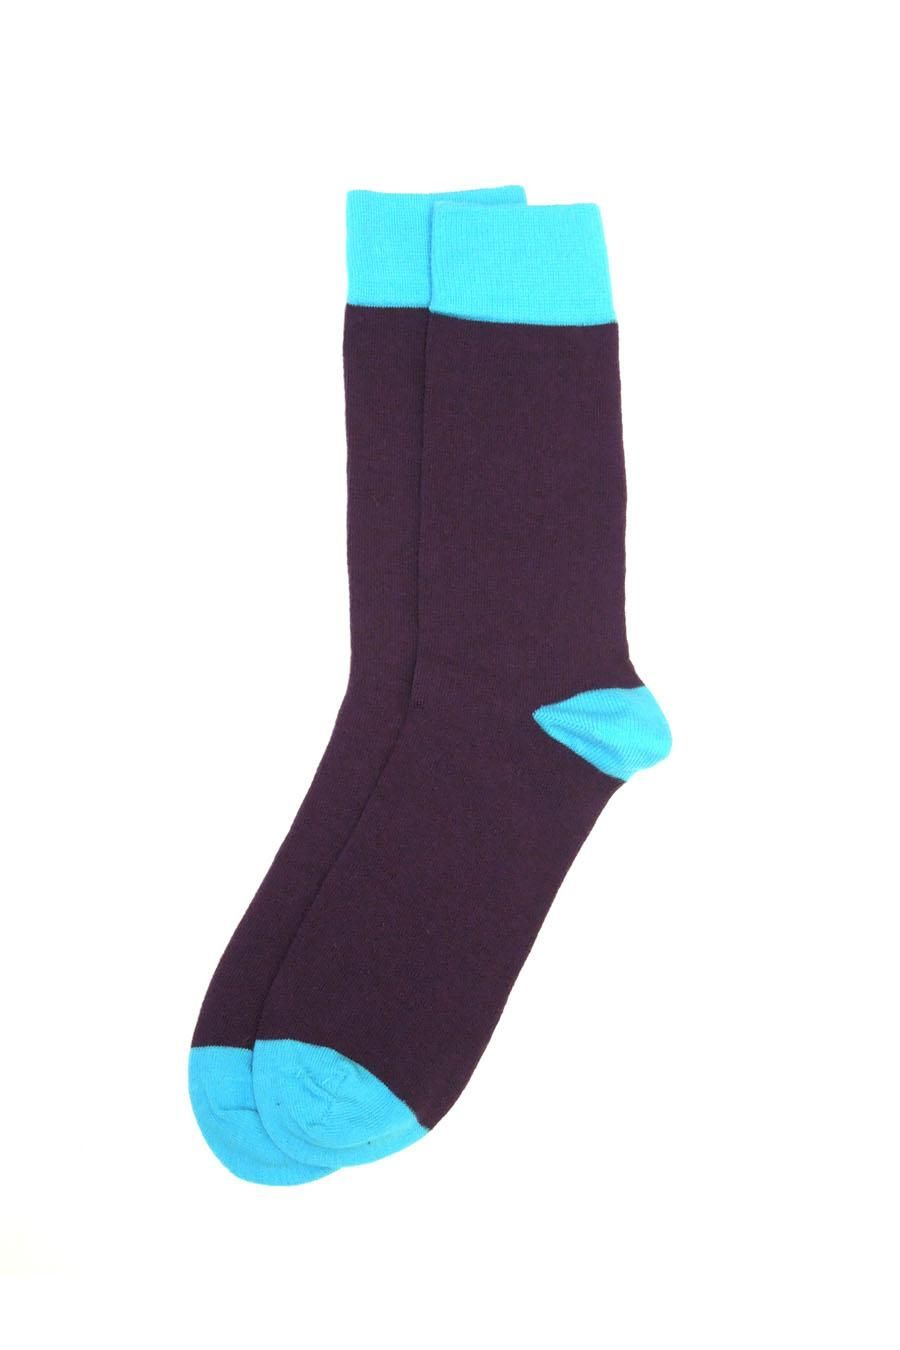 Men's Two Tone Socks